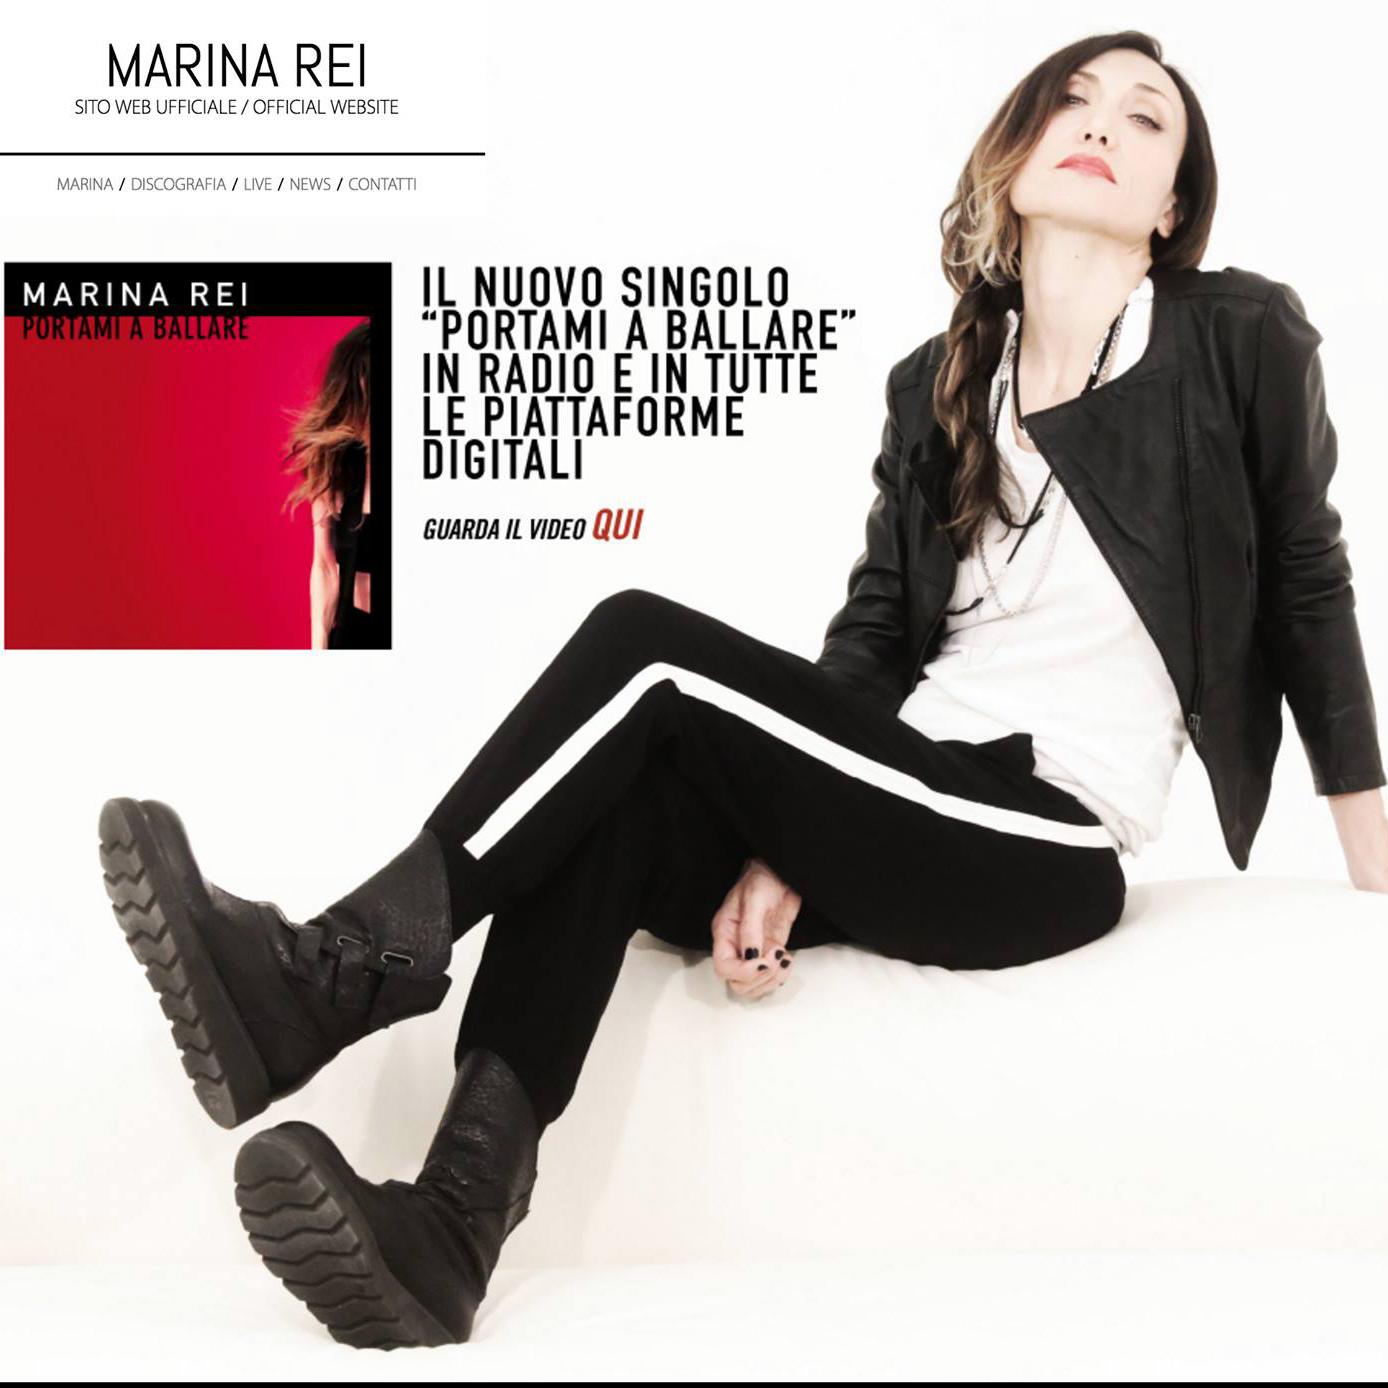 Marina Rei – Website